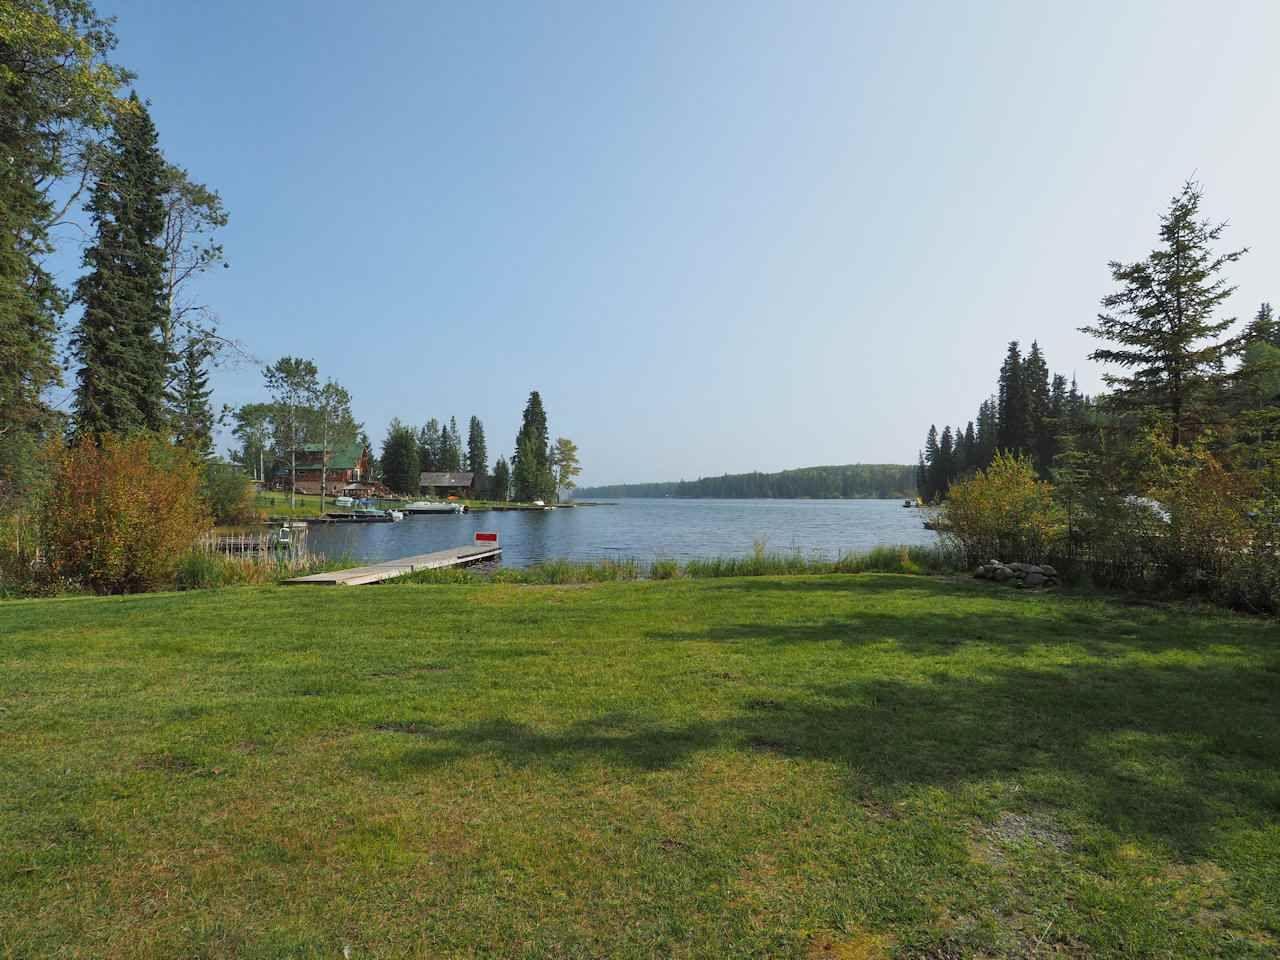 Photo 5: Photos: 7271 NATH Road in Bridge Lake: Bridge Lake/Sheridan Lake Land for sale (100 Mile House (Zone 10))  : MLS®# R2496086